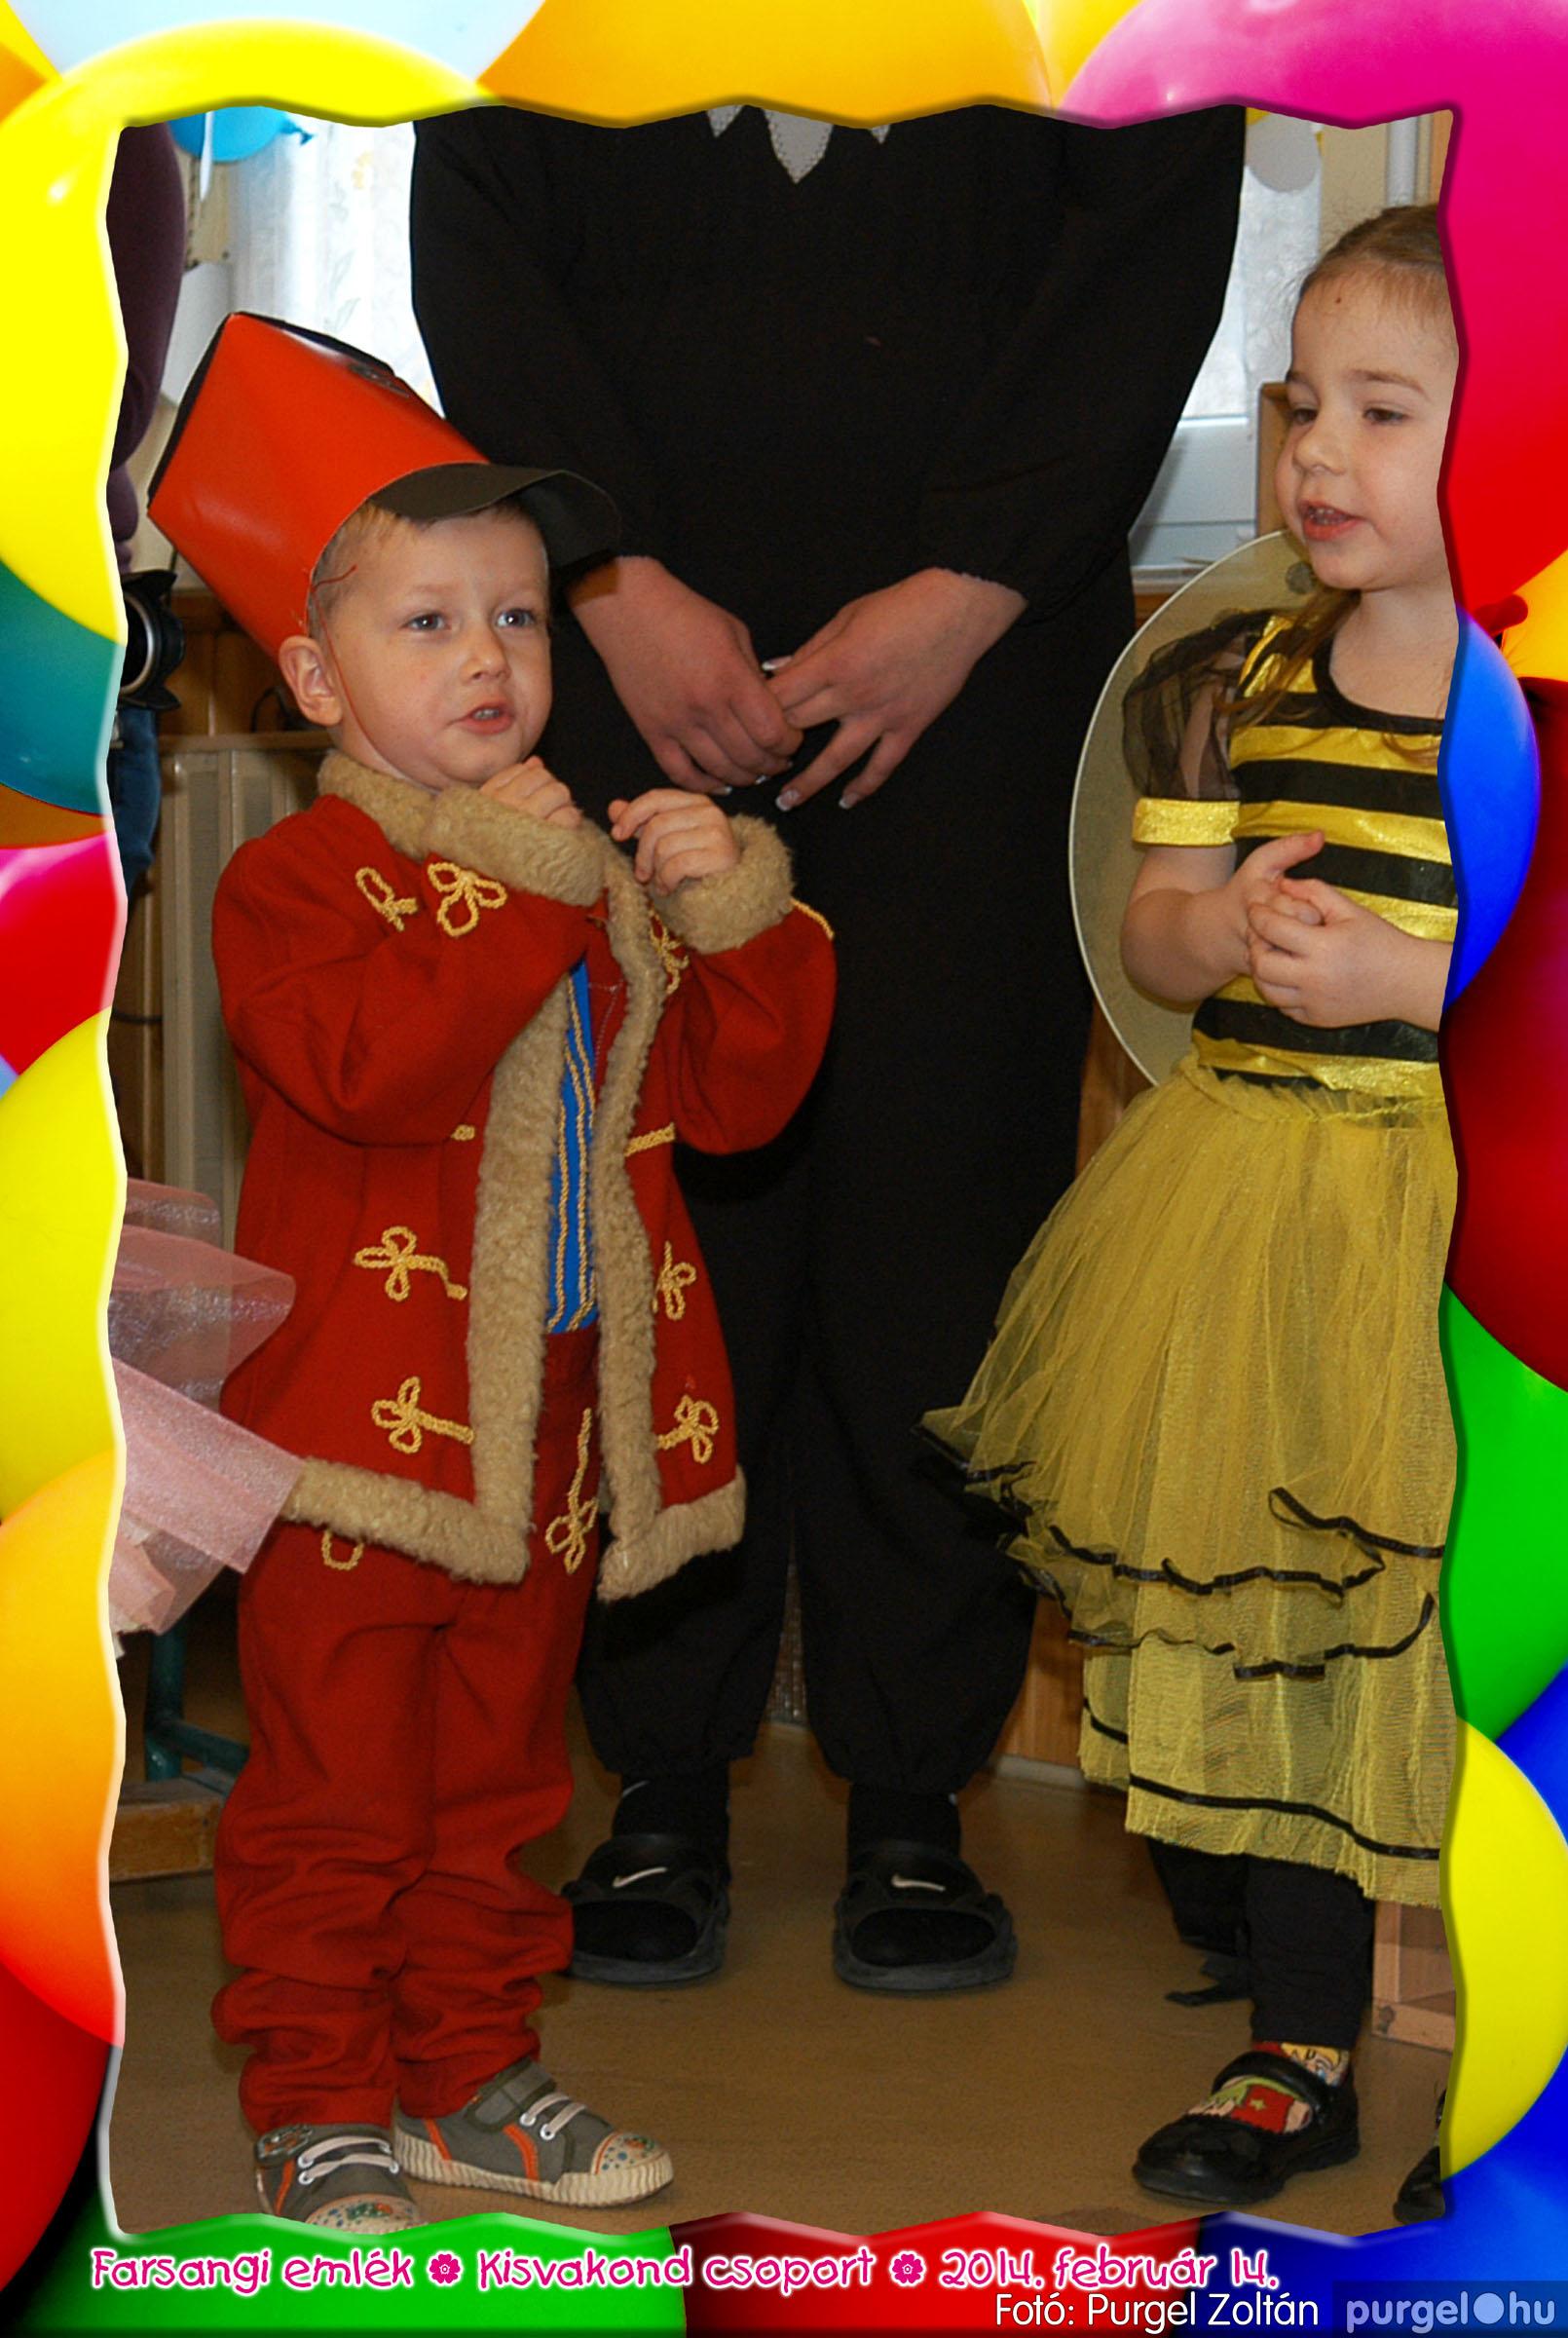 2014.02.14. 182 Kurca-parti Óvoda farsang 2014. - Kisvakond csoport - Fotó:PURGEL ZOLTÁN© 402.jpg